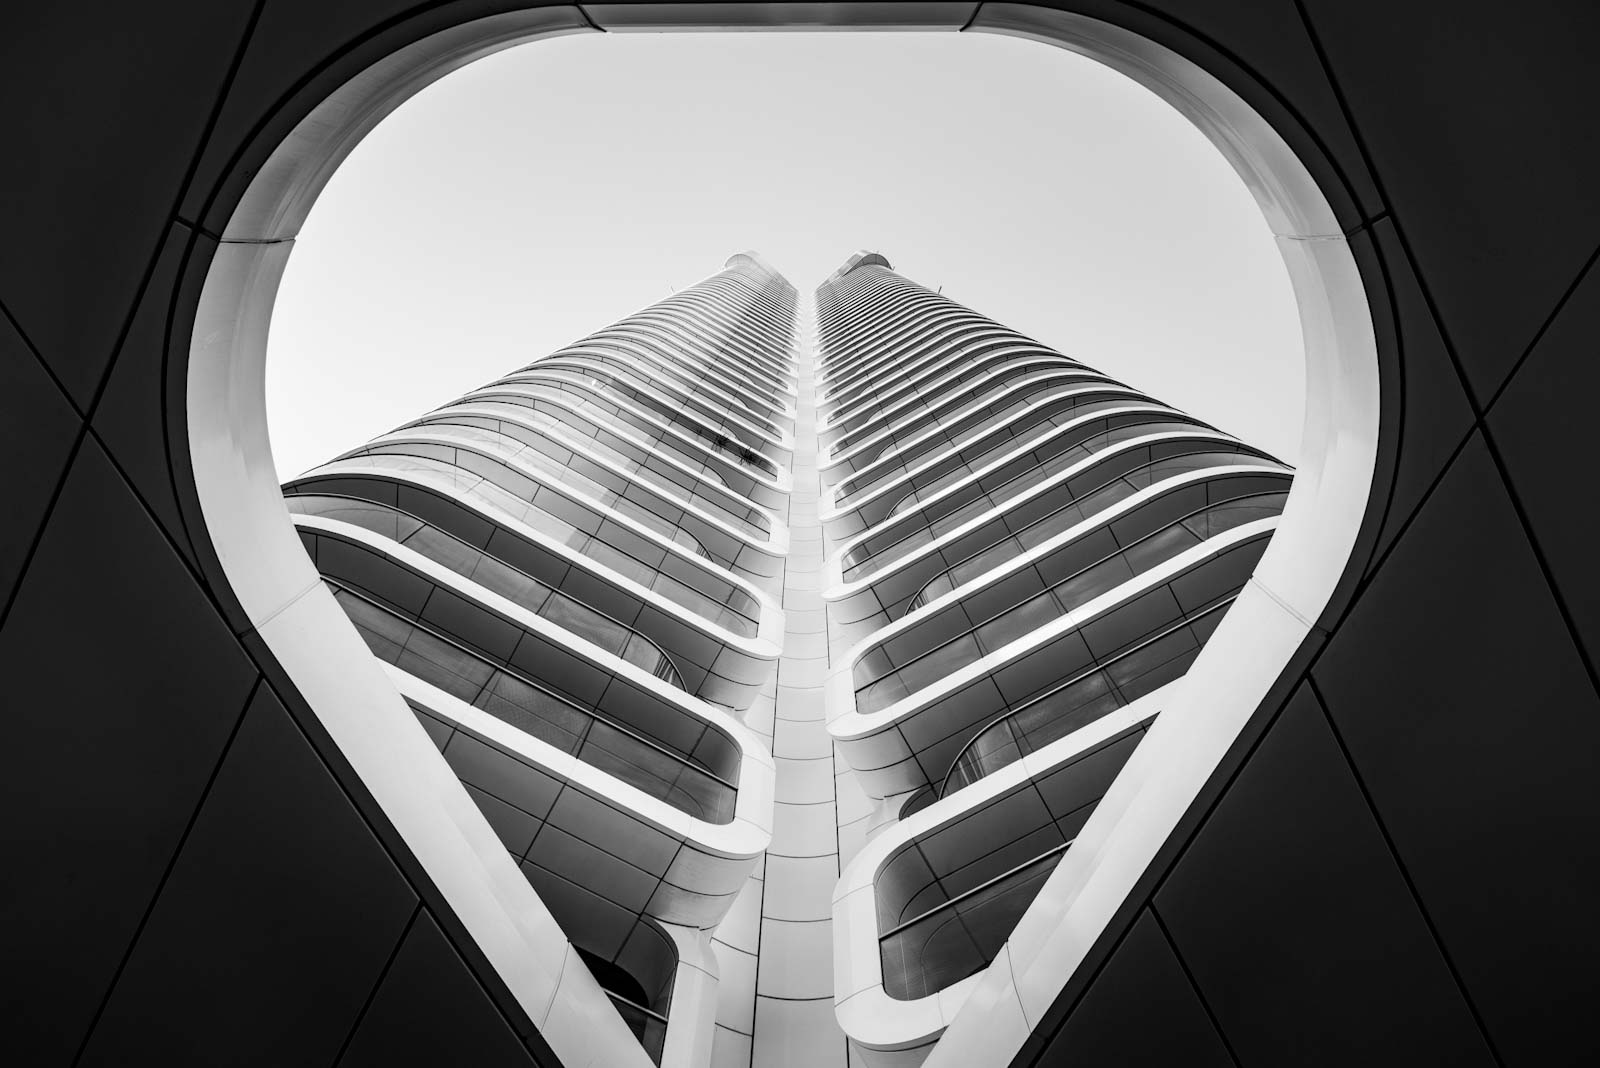 #WeeklyBoys - Woche 17 - Grand Tower Frankfurt